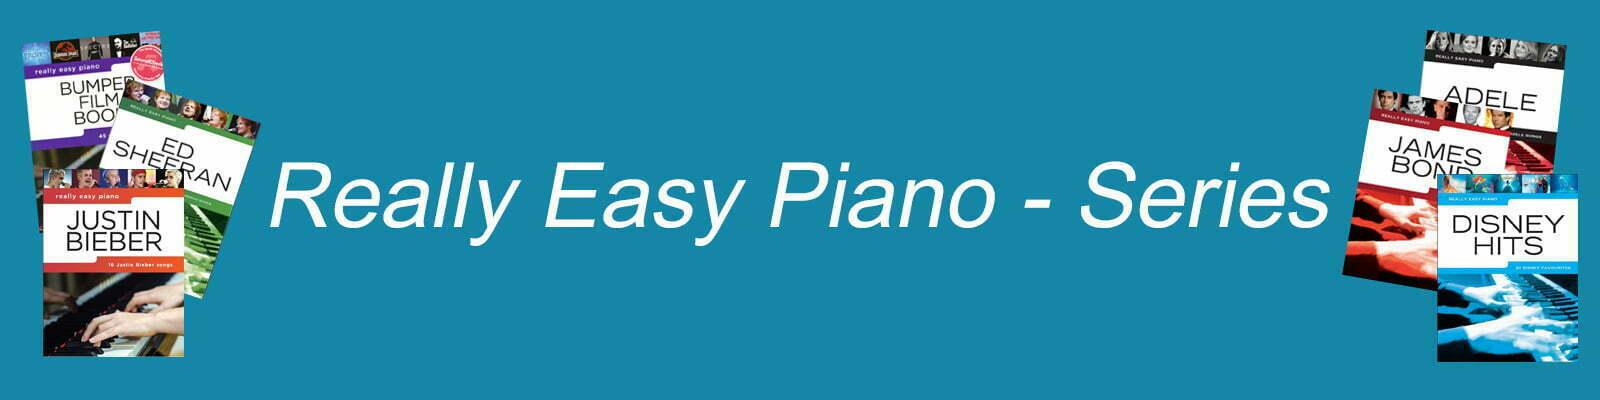 Really Easy Piano Series